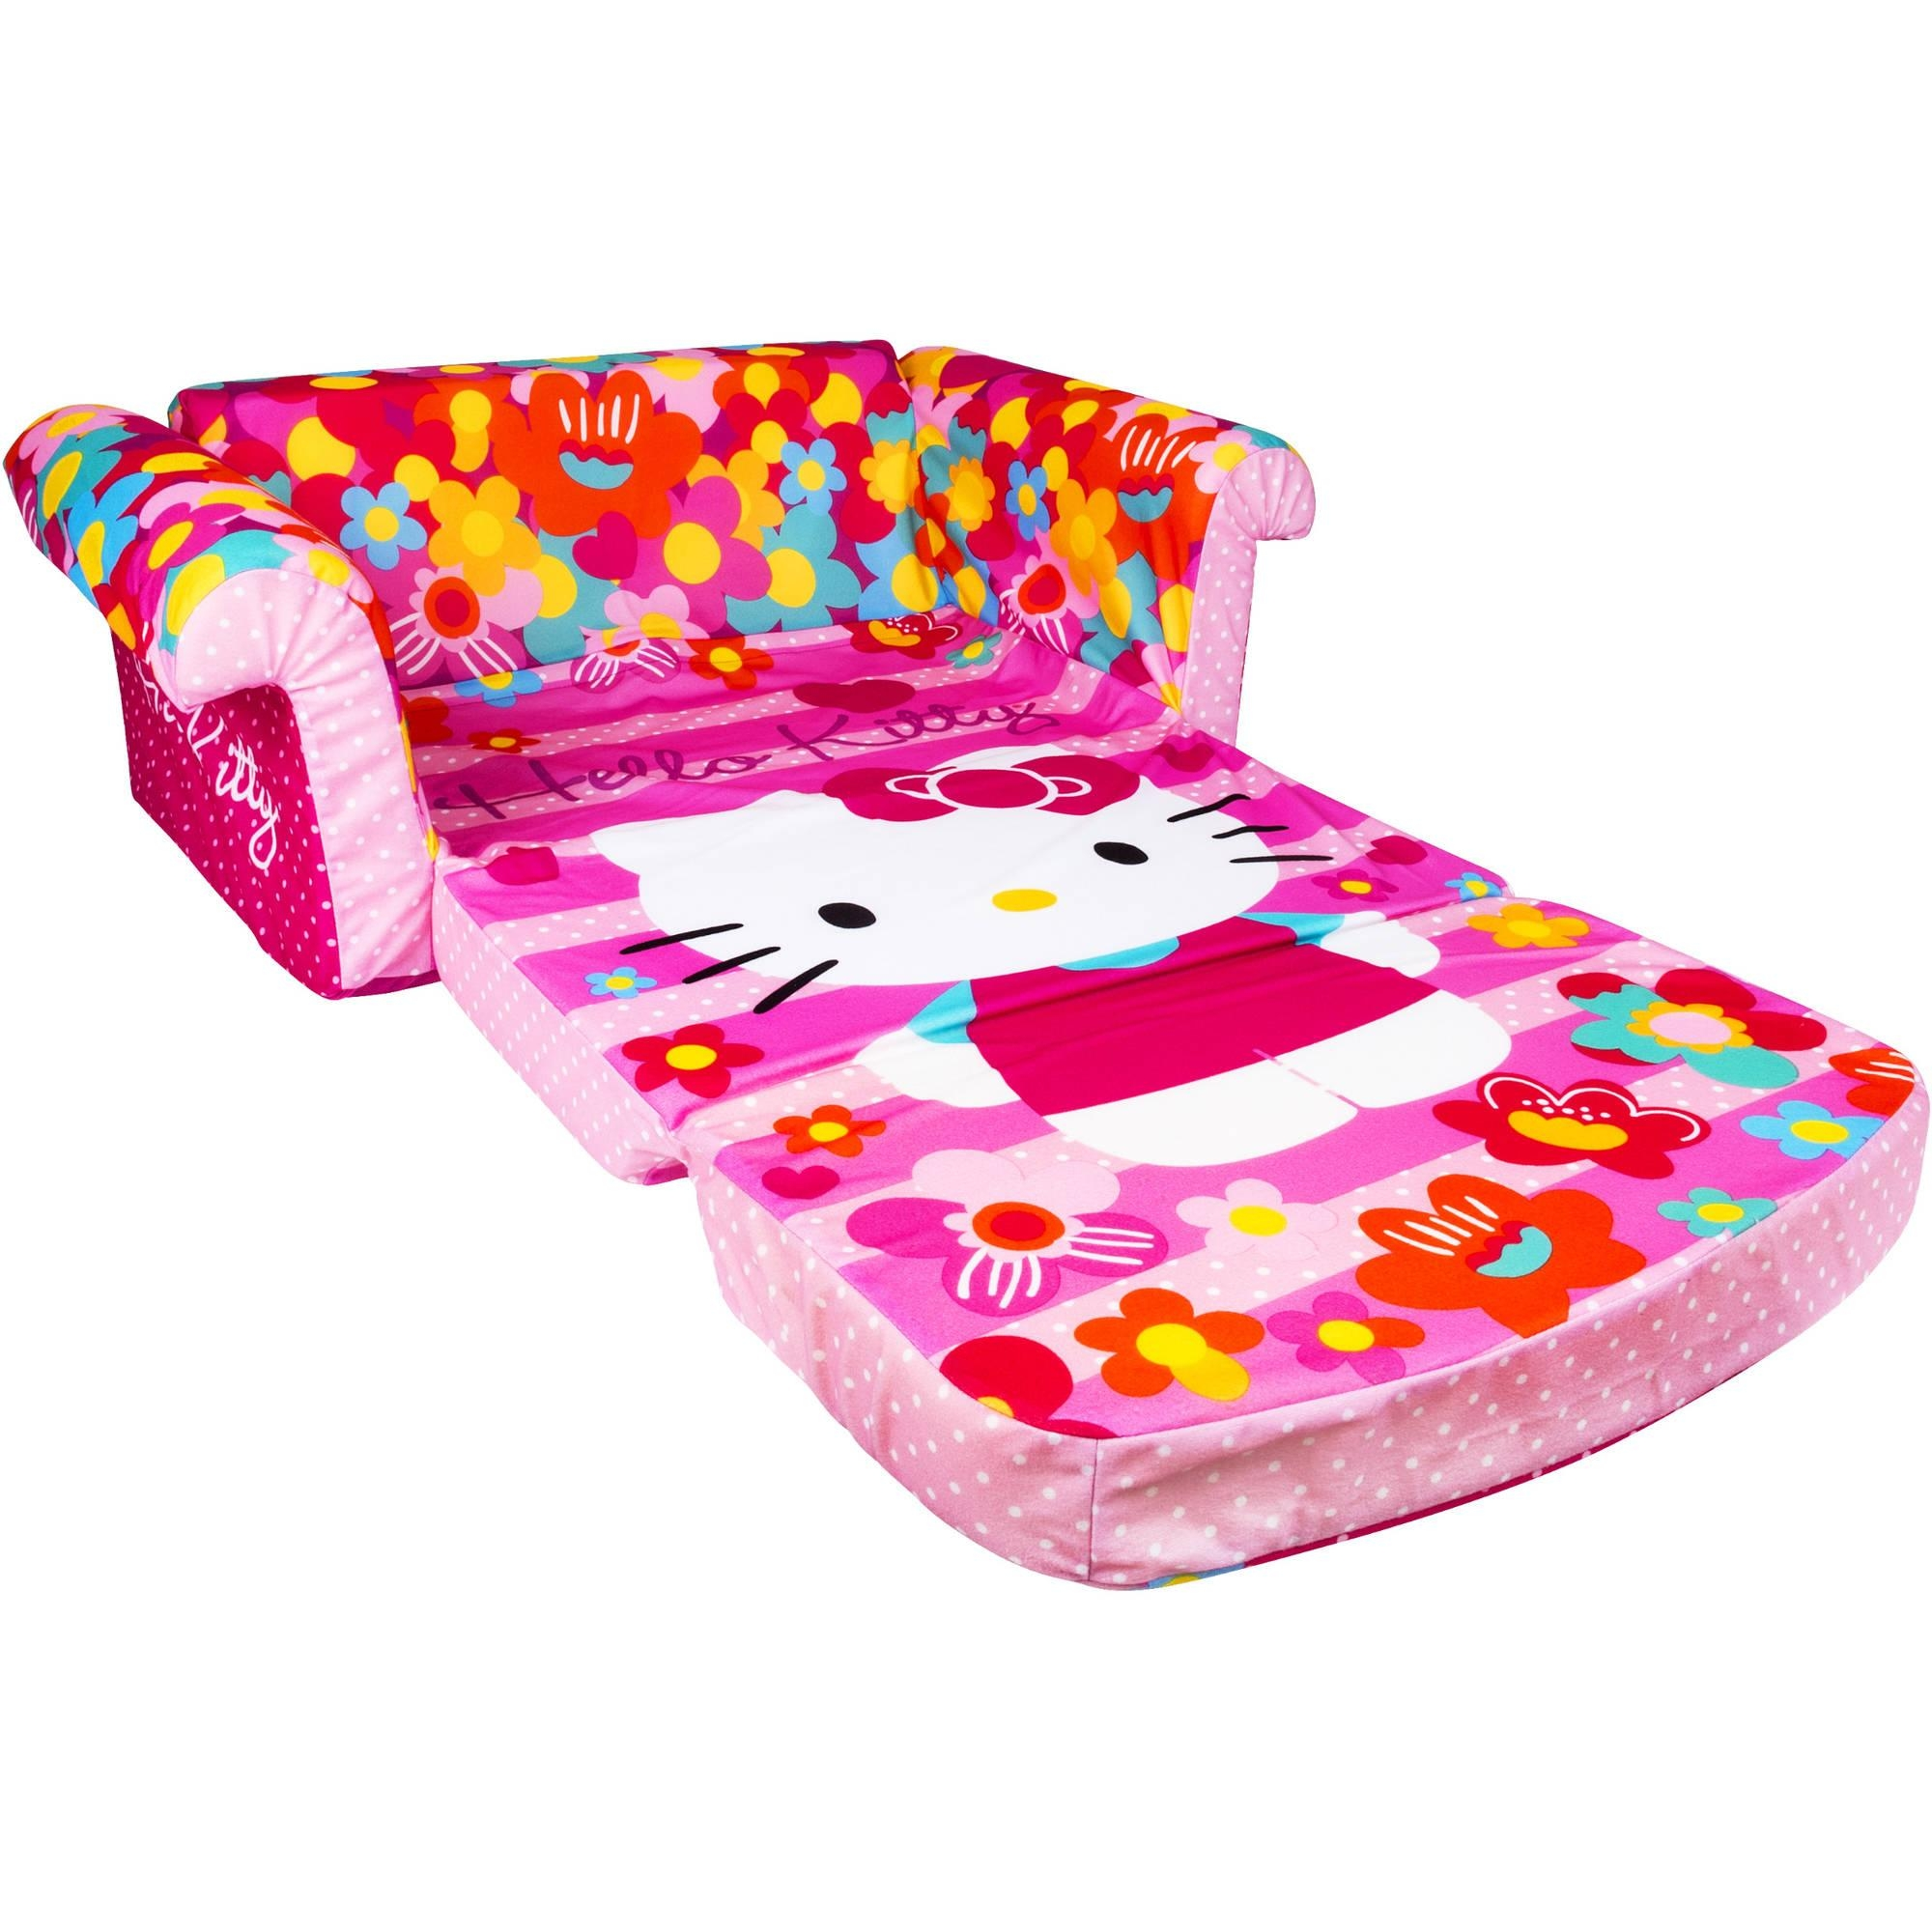 Marshmallow Furniture Flip Open Sofa, Hello Kitty – Walmart For Flip Open Kids Sofas (Image 12 of 20)